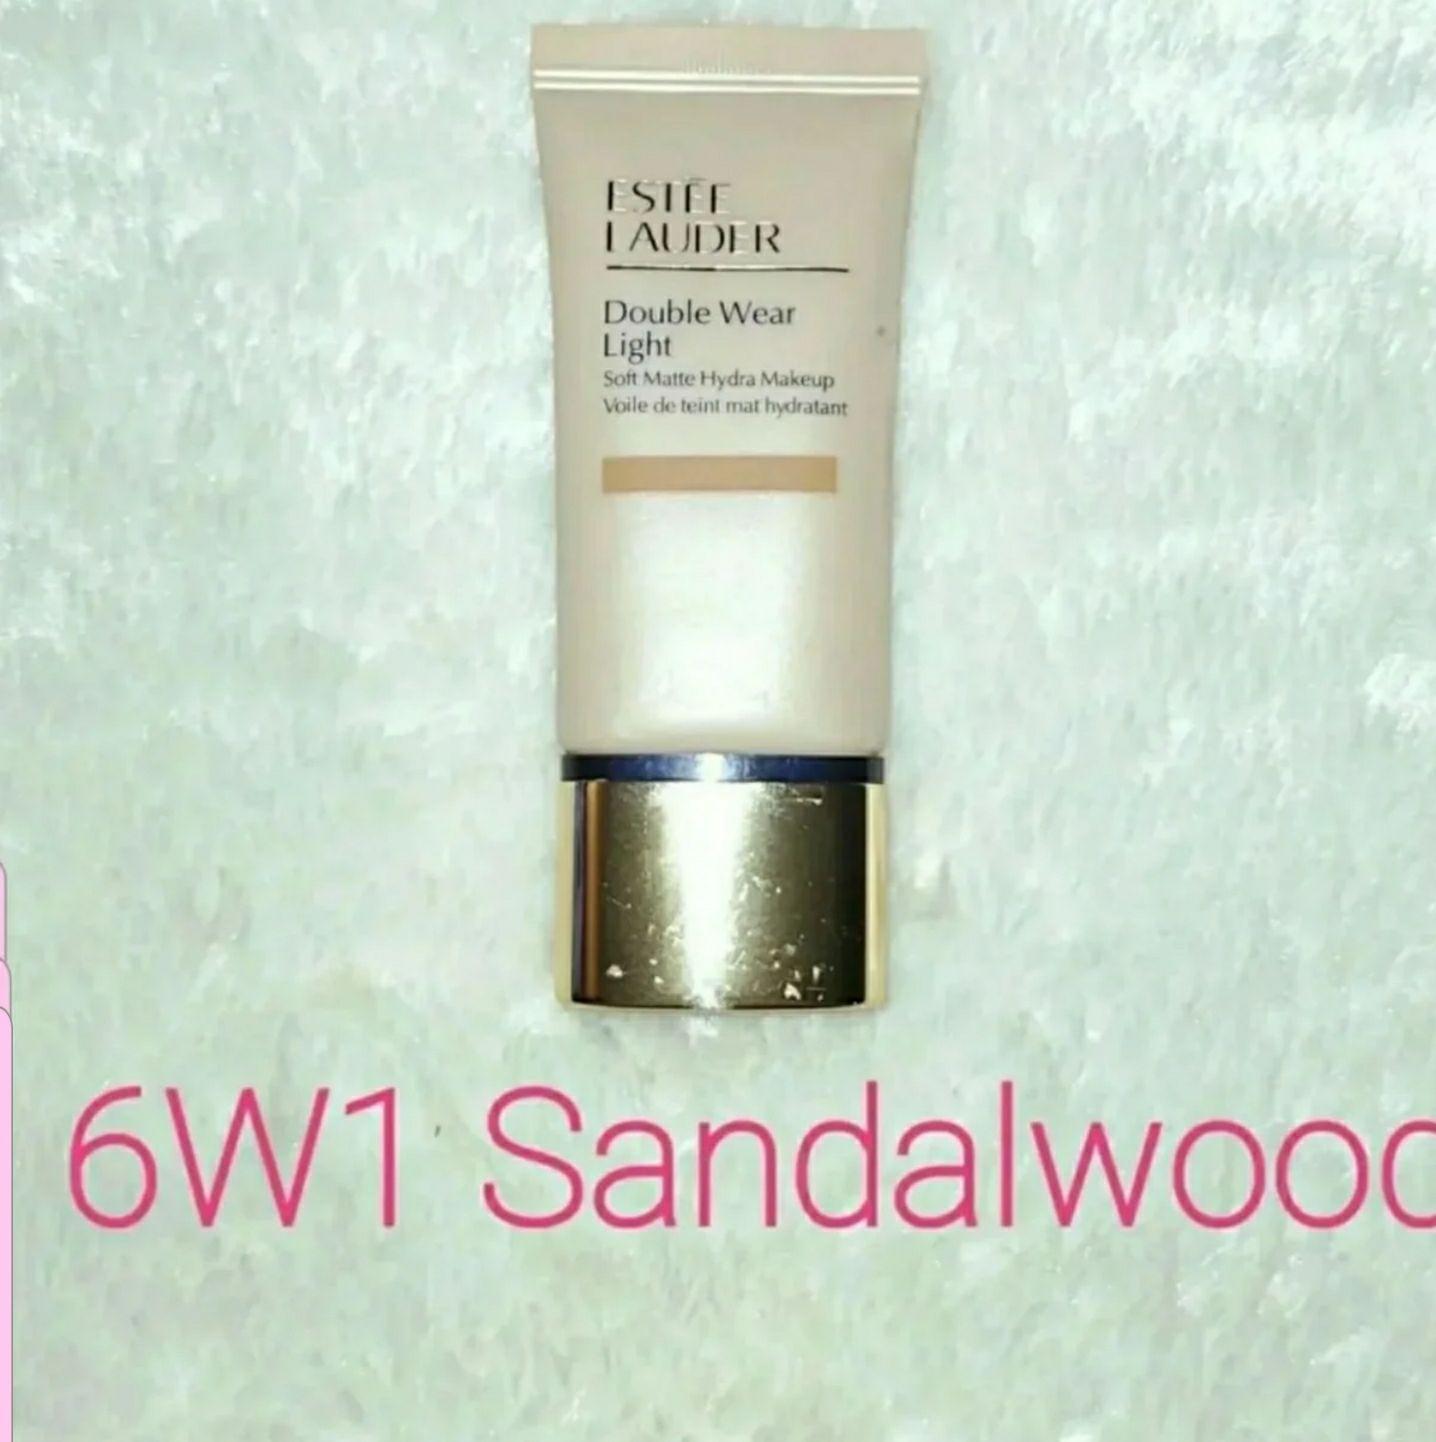 Estee Lauder Double Wear Light Soft Matte Hydra Makeup 6W1